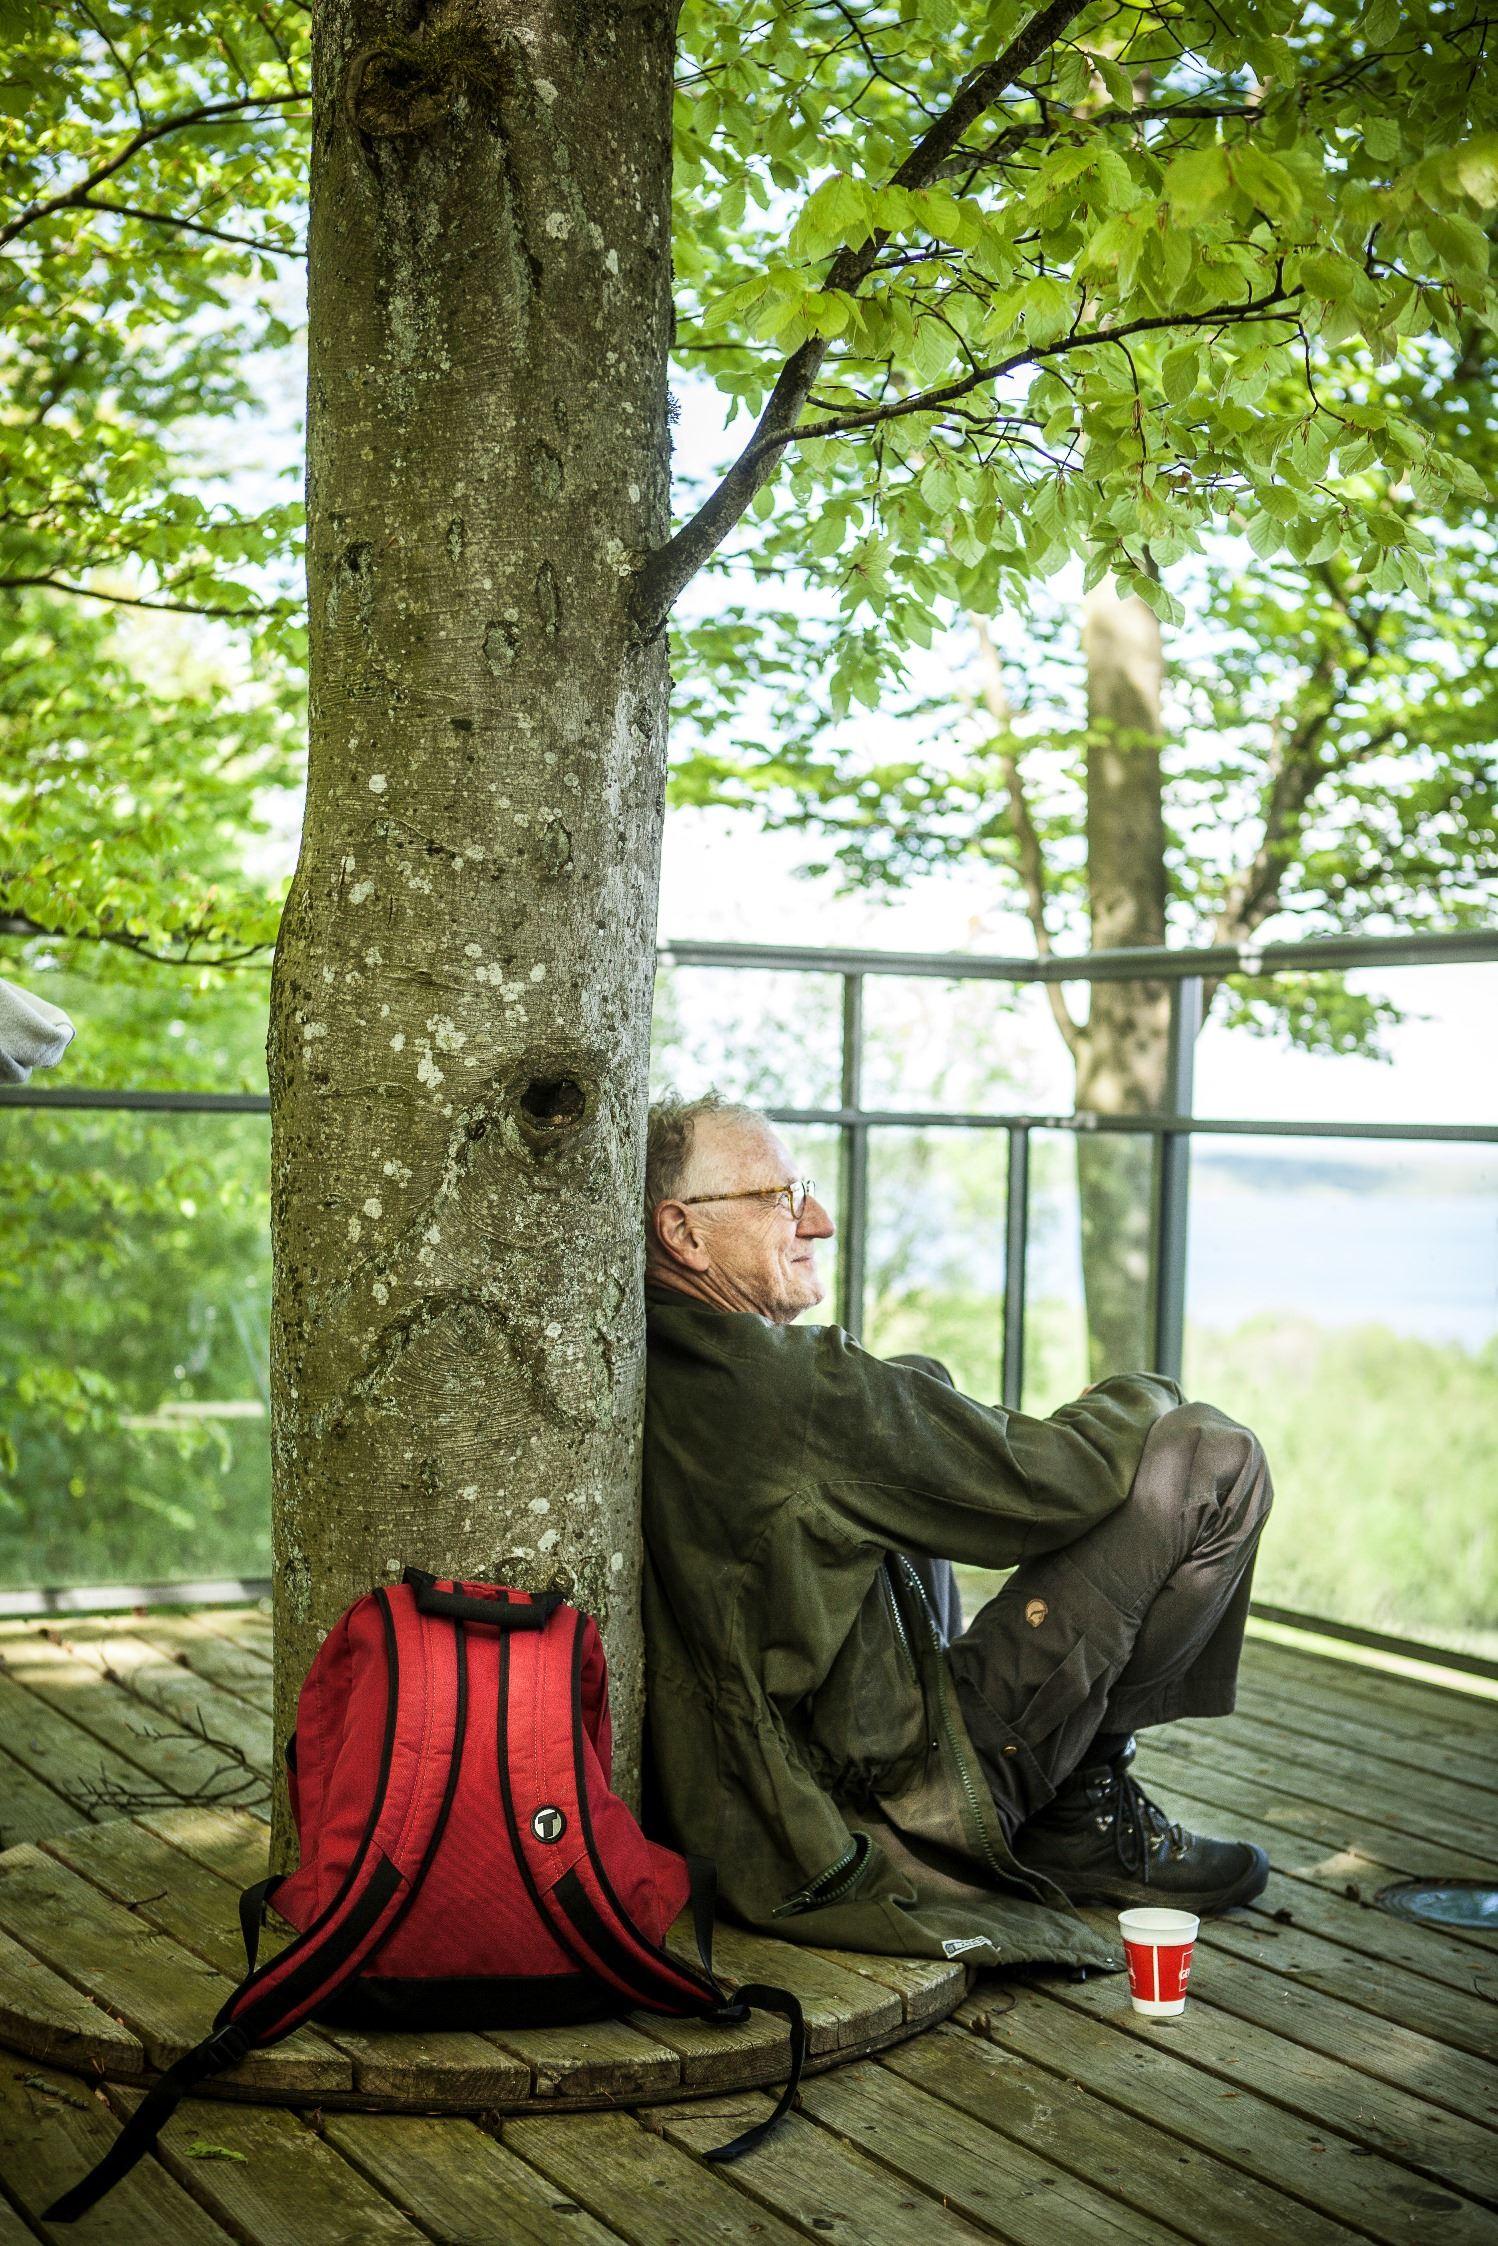 Foto: Fotograf Funke, Naturgebiete bei Hovdala und Mölleröd